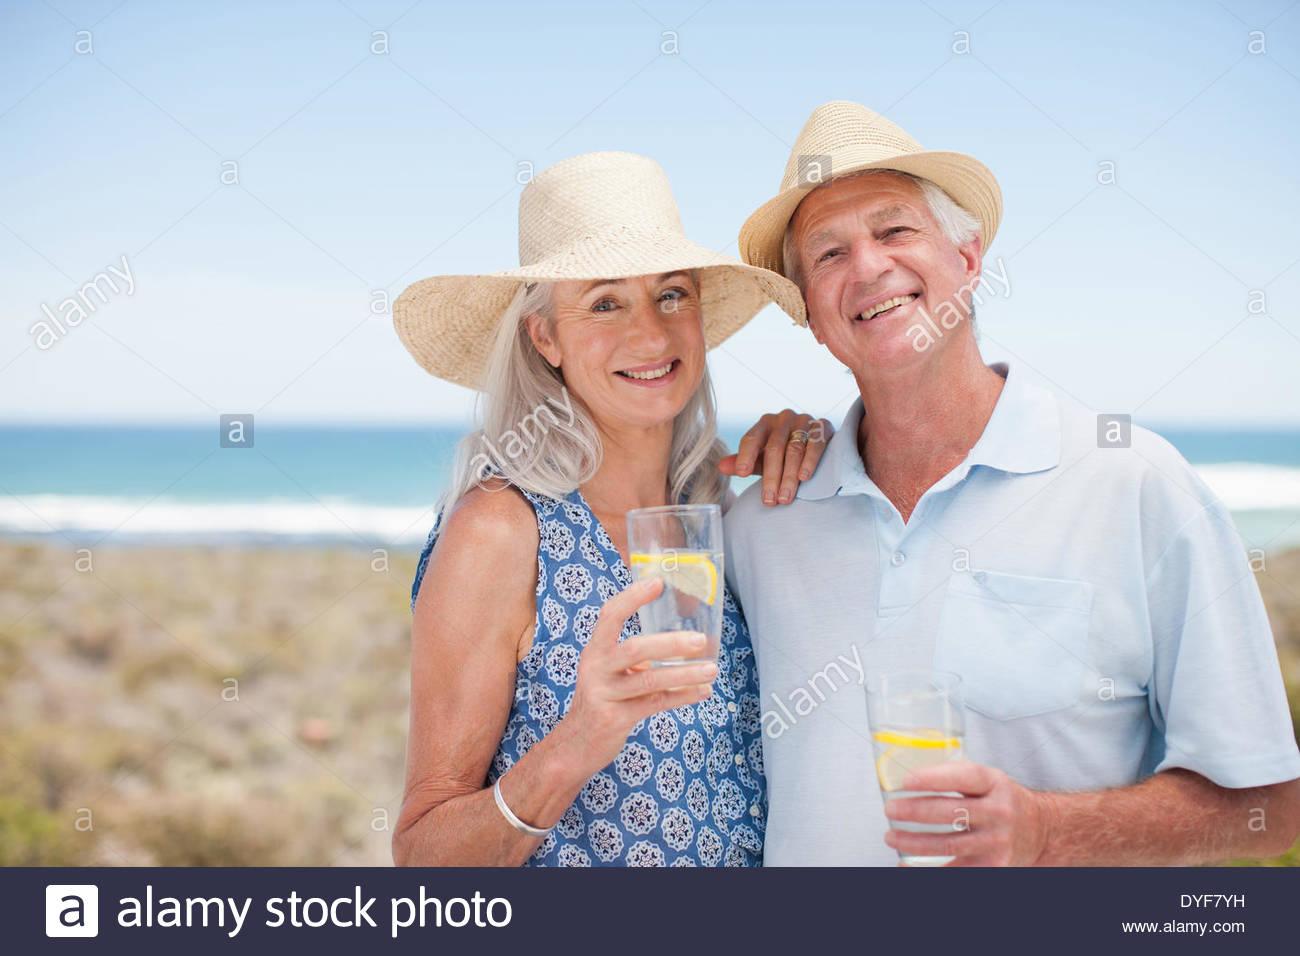 Alto par de agua potable en la playa Imagen De Stock